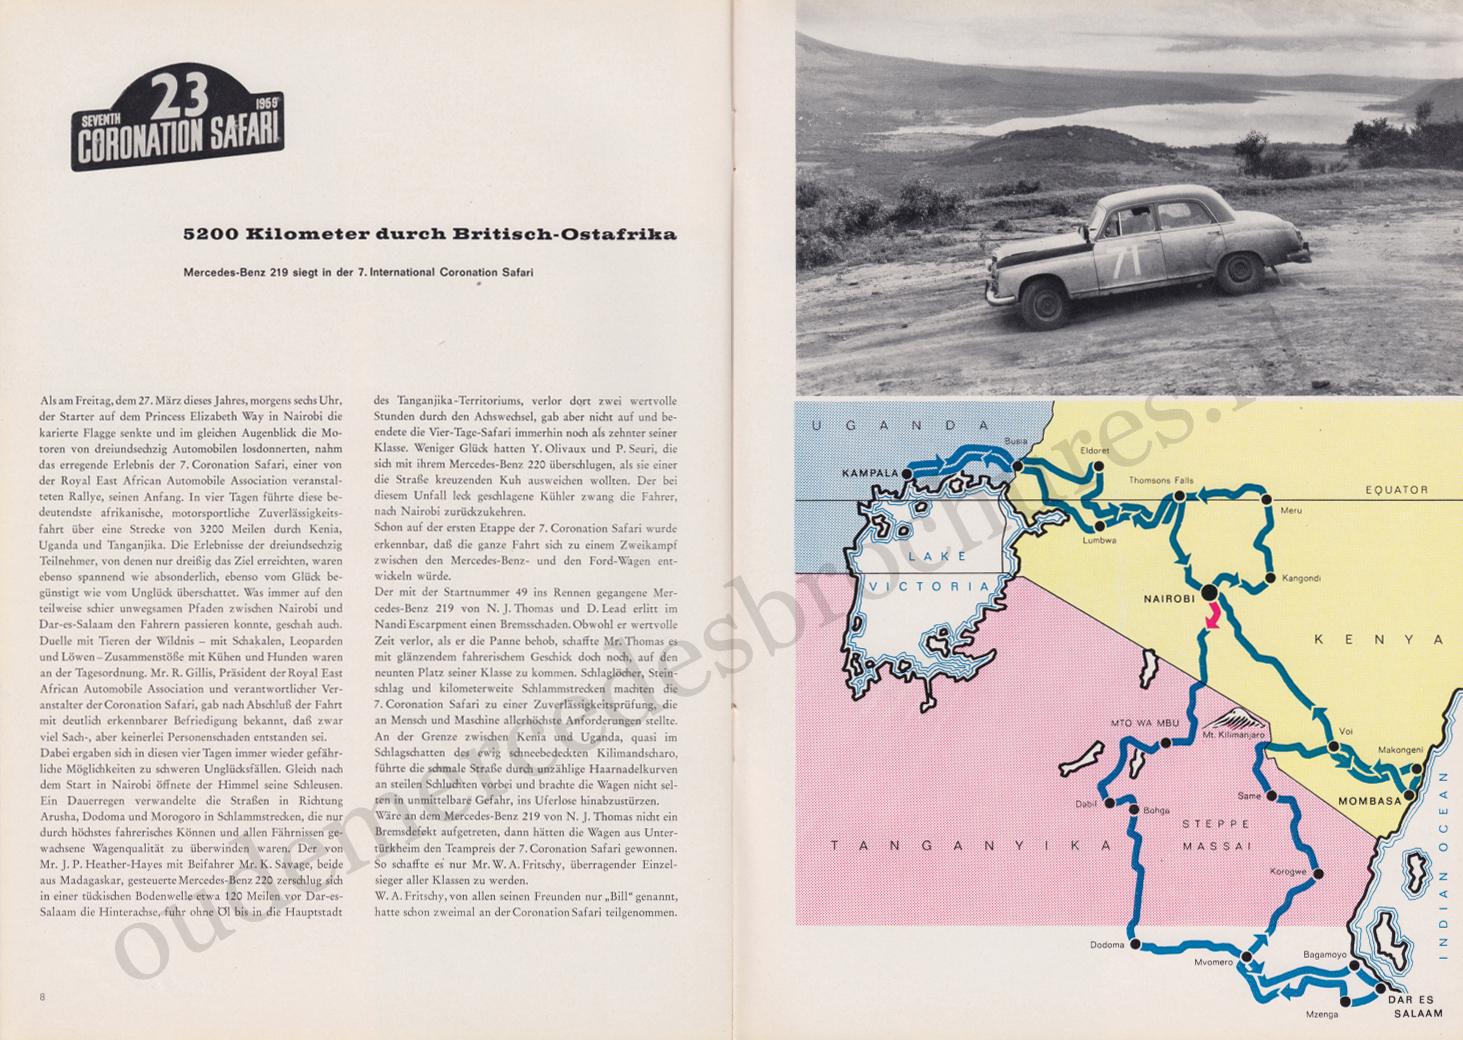 (REVISTA): Periódico In aller welt n.º 33 - Mercedes-Benz no mundo - 1959 - multilingue 005